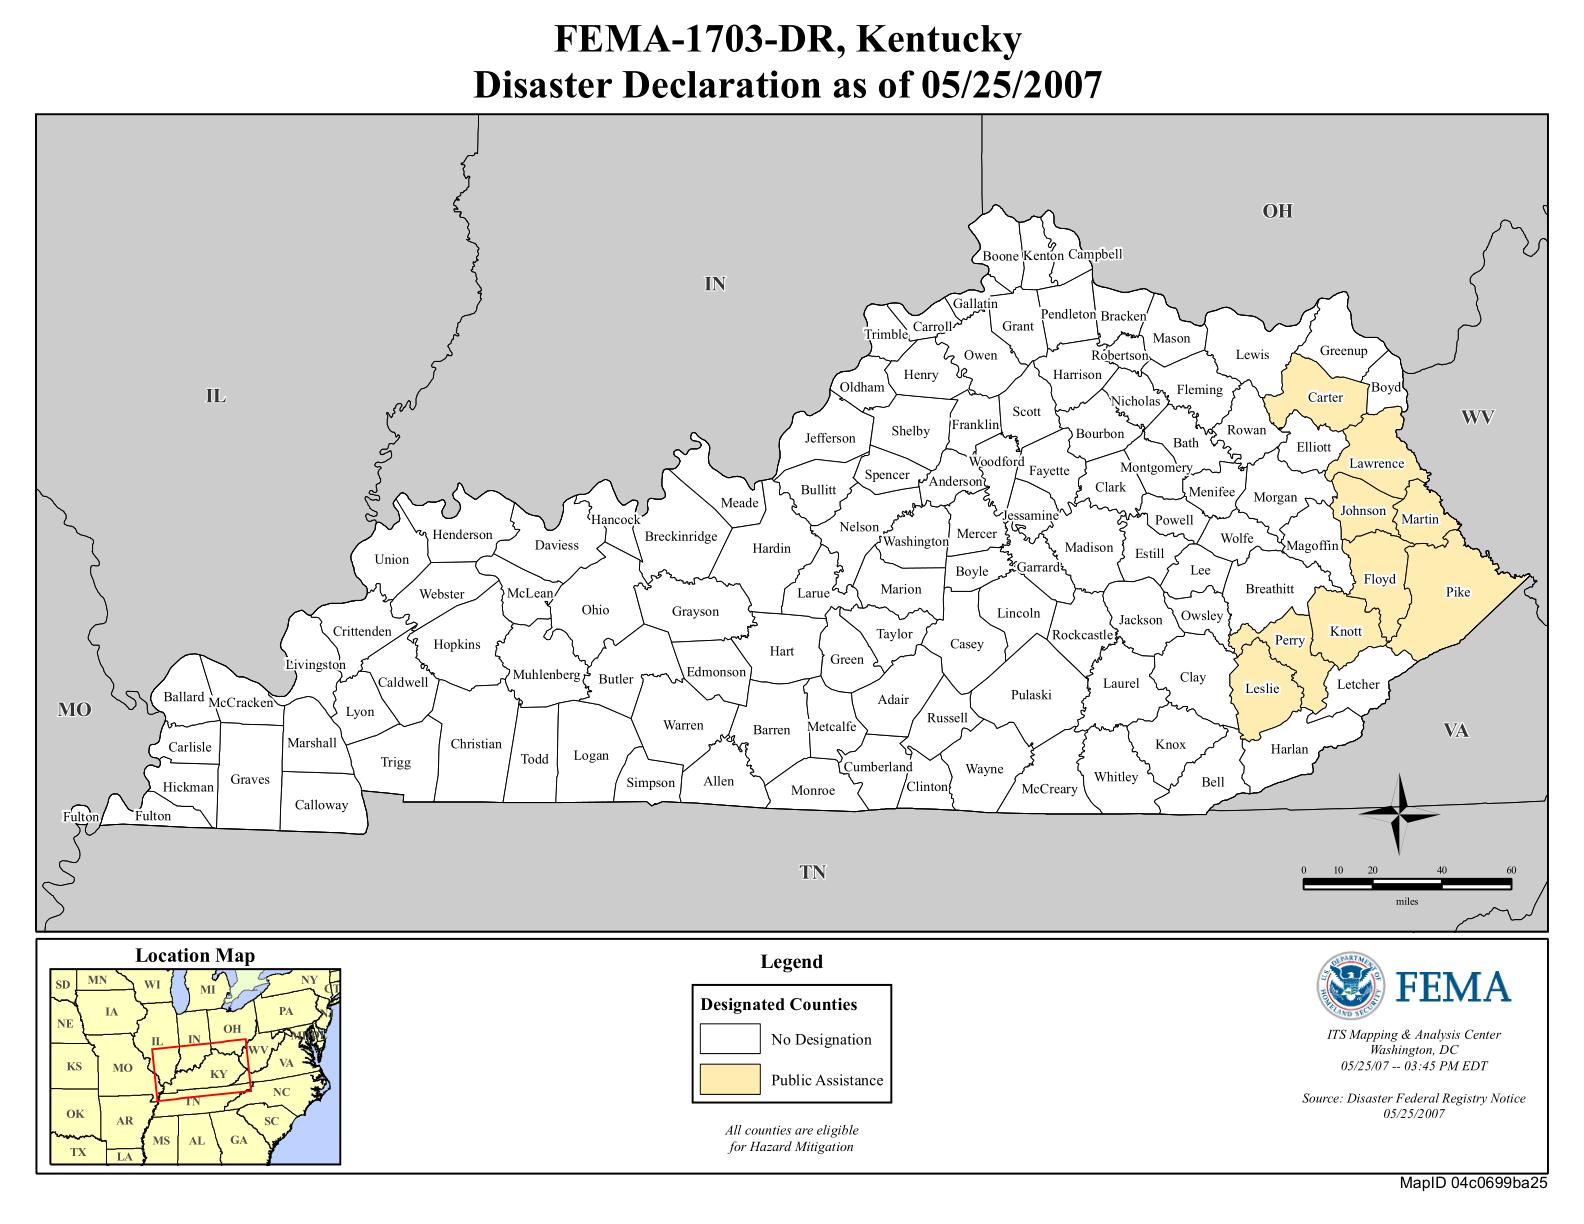 Kentucky Severe Storms Flooding Mudslides and Rockslides DR